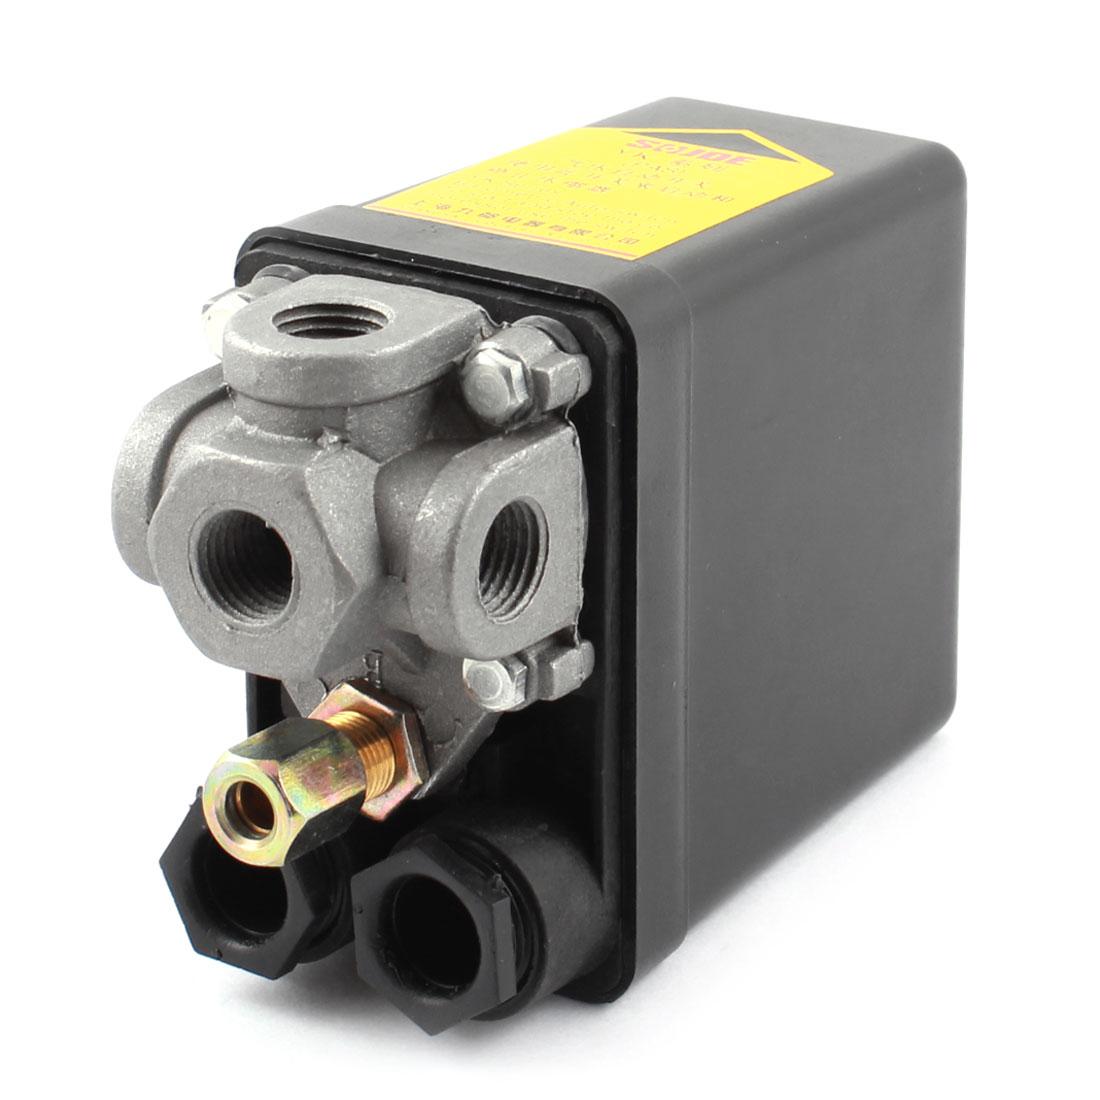 Air Compressor Pressure Switch Control Valve DPST 175PSI 12Bar 3-Port 1/4PT AC 240V 20A